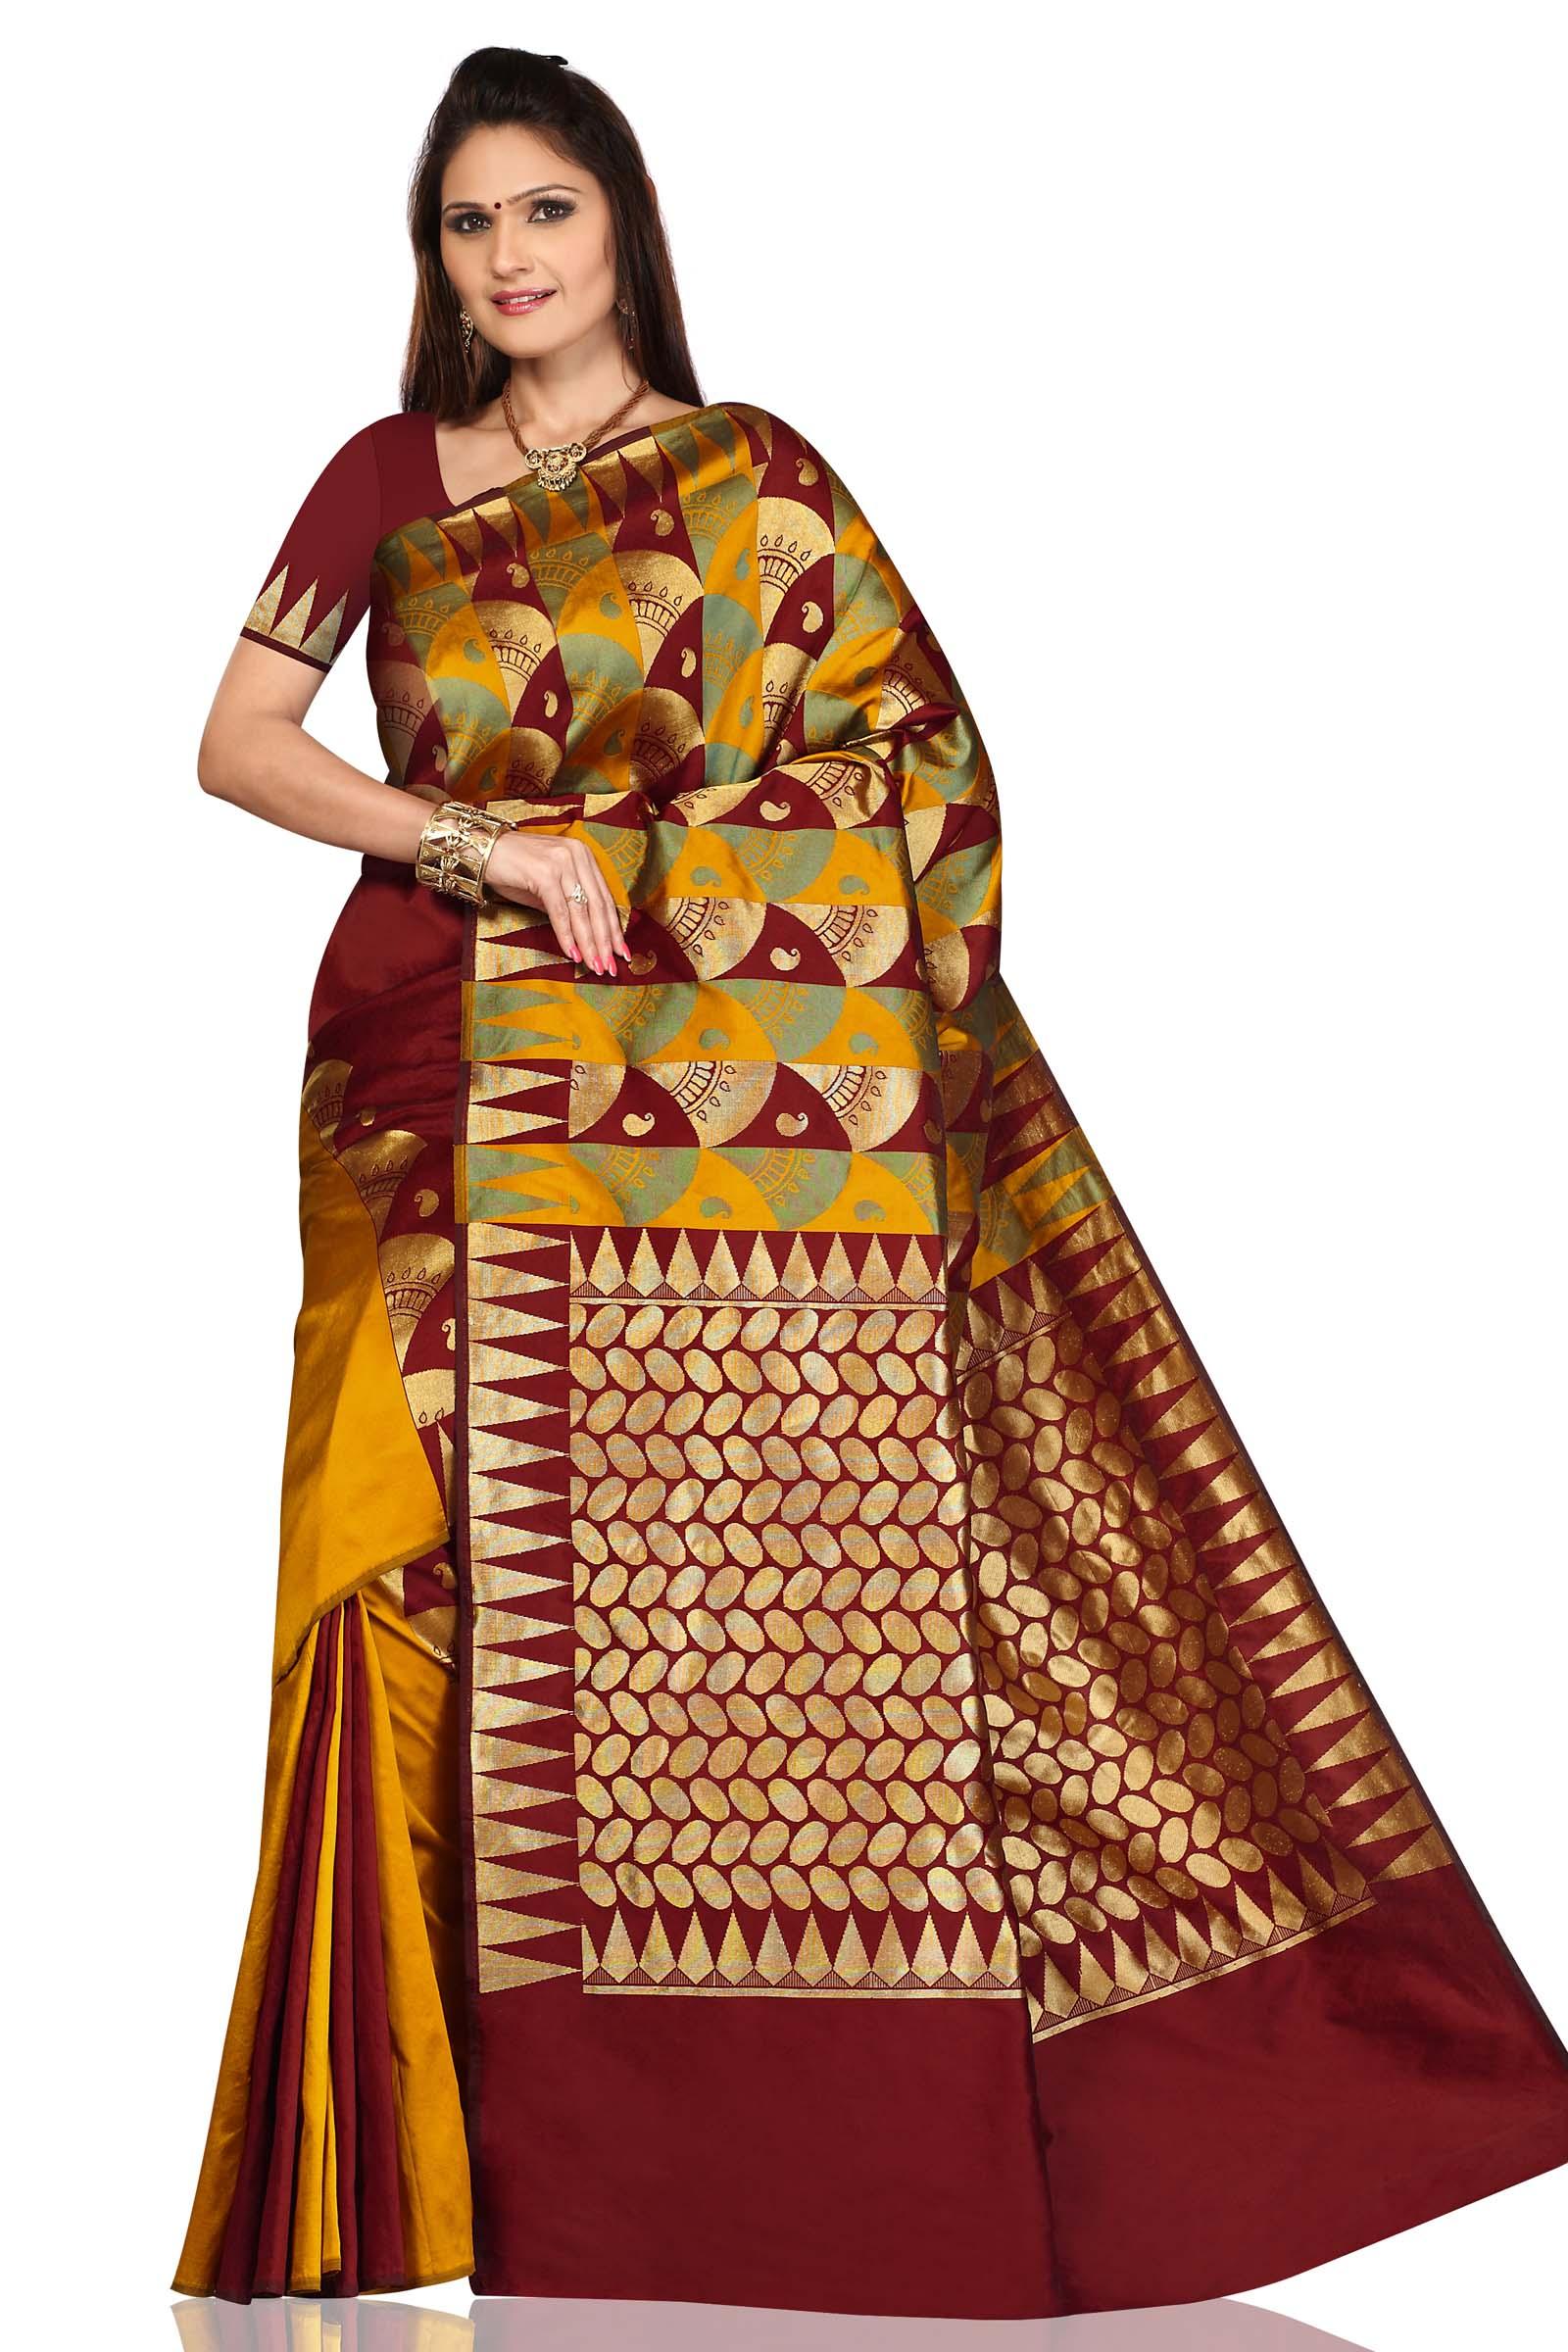 Pumpkin Gold with Maroon Art Silk Sari Saree bellydance wrap